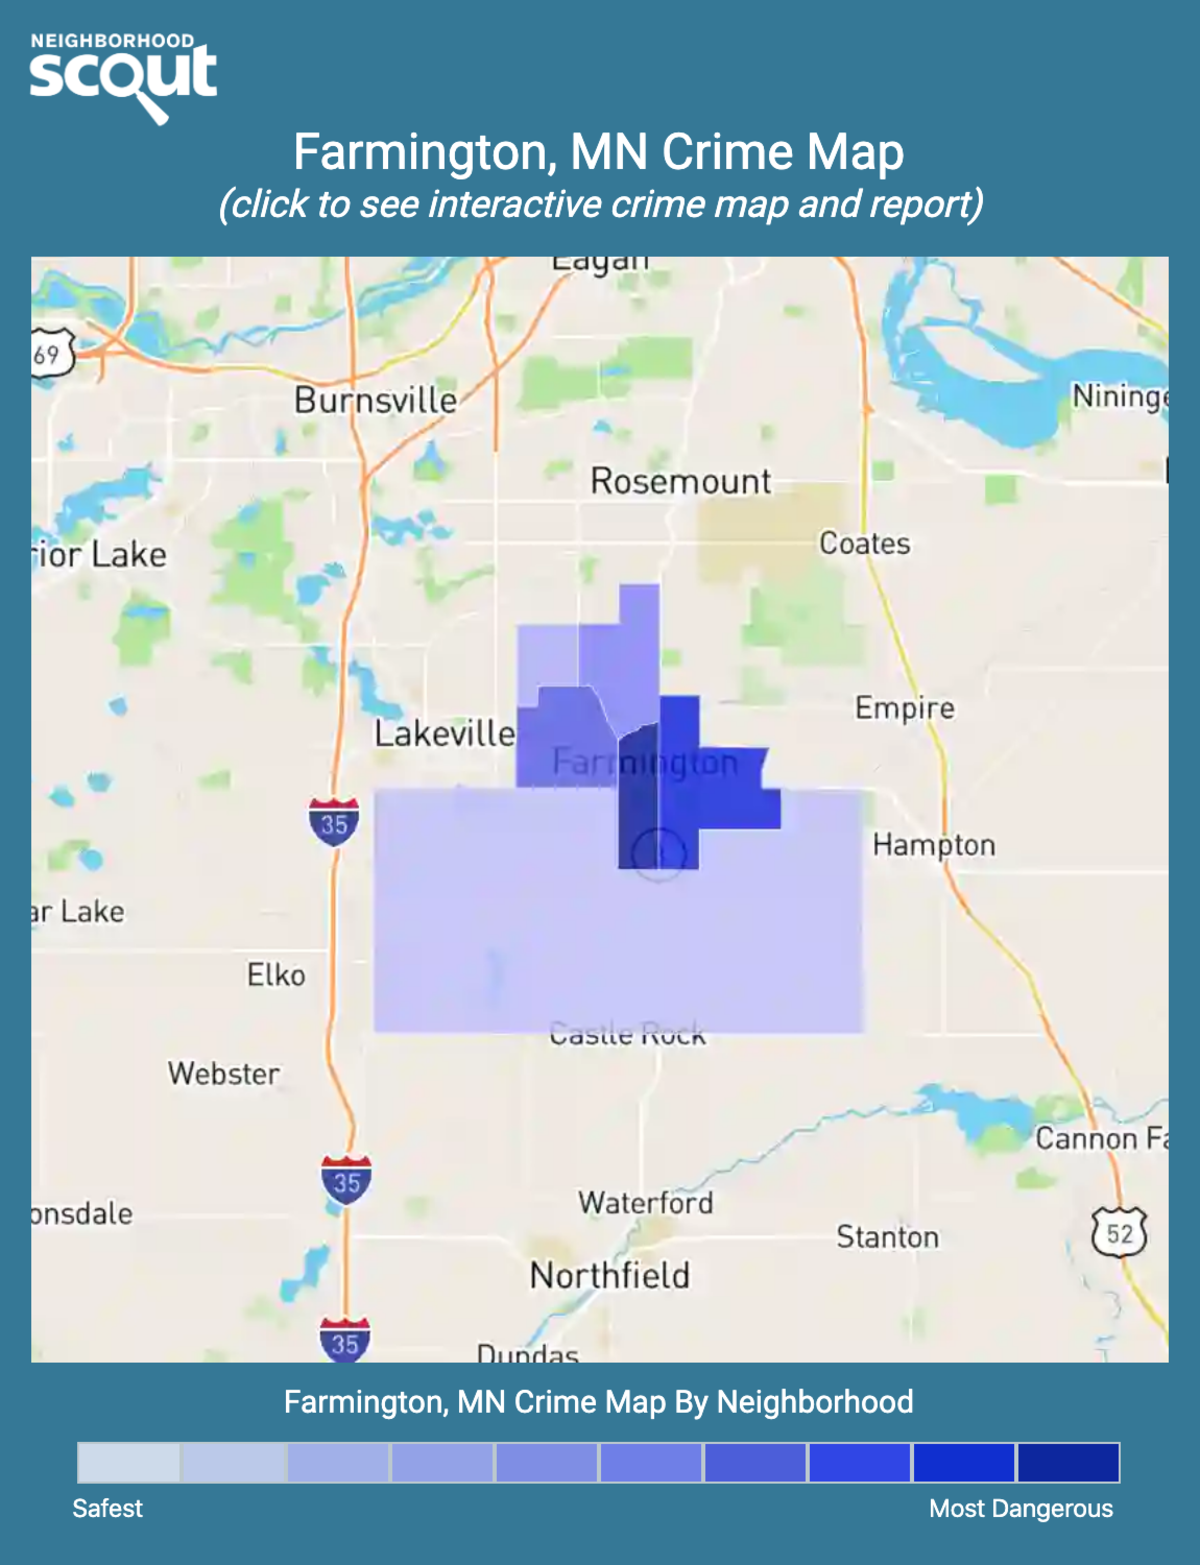 Farmington, Minnesota crime map